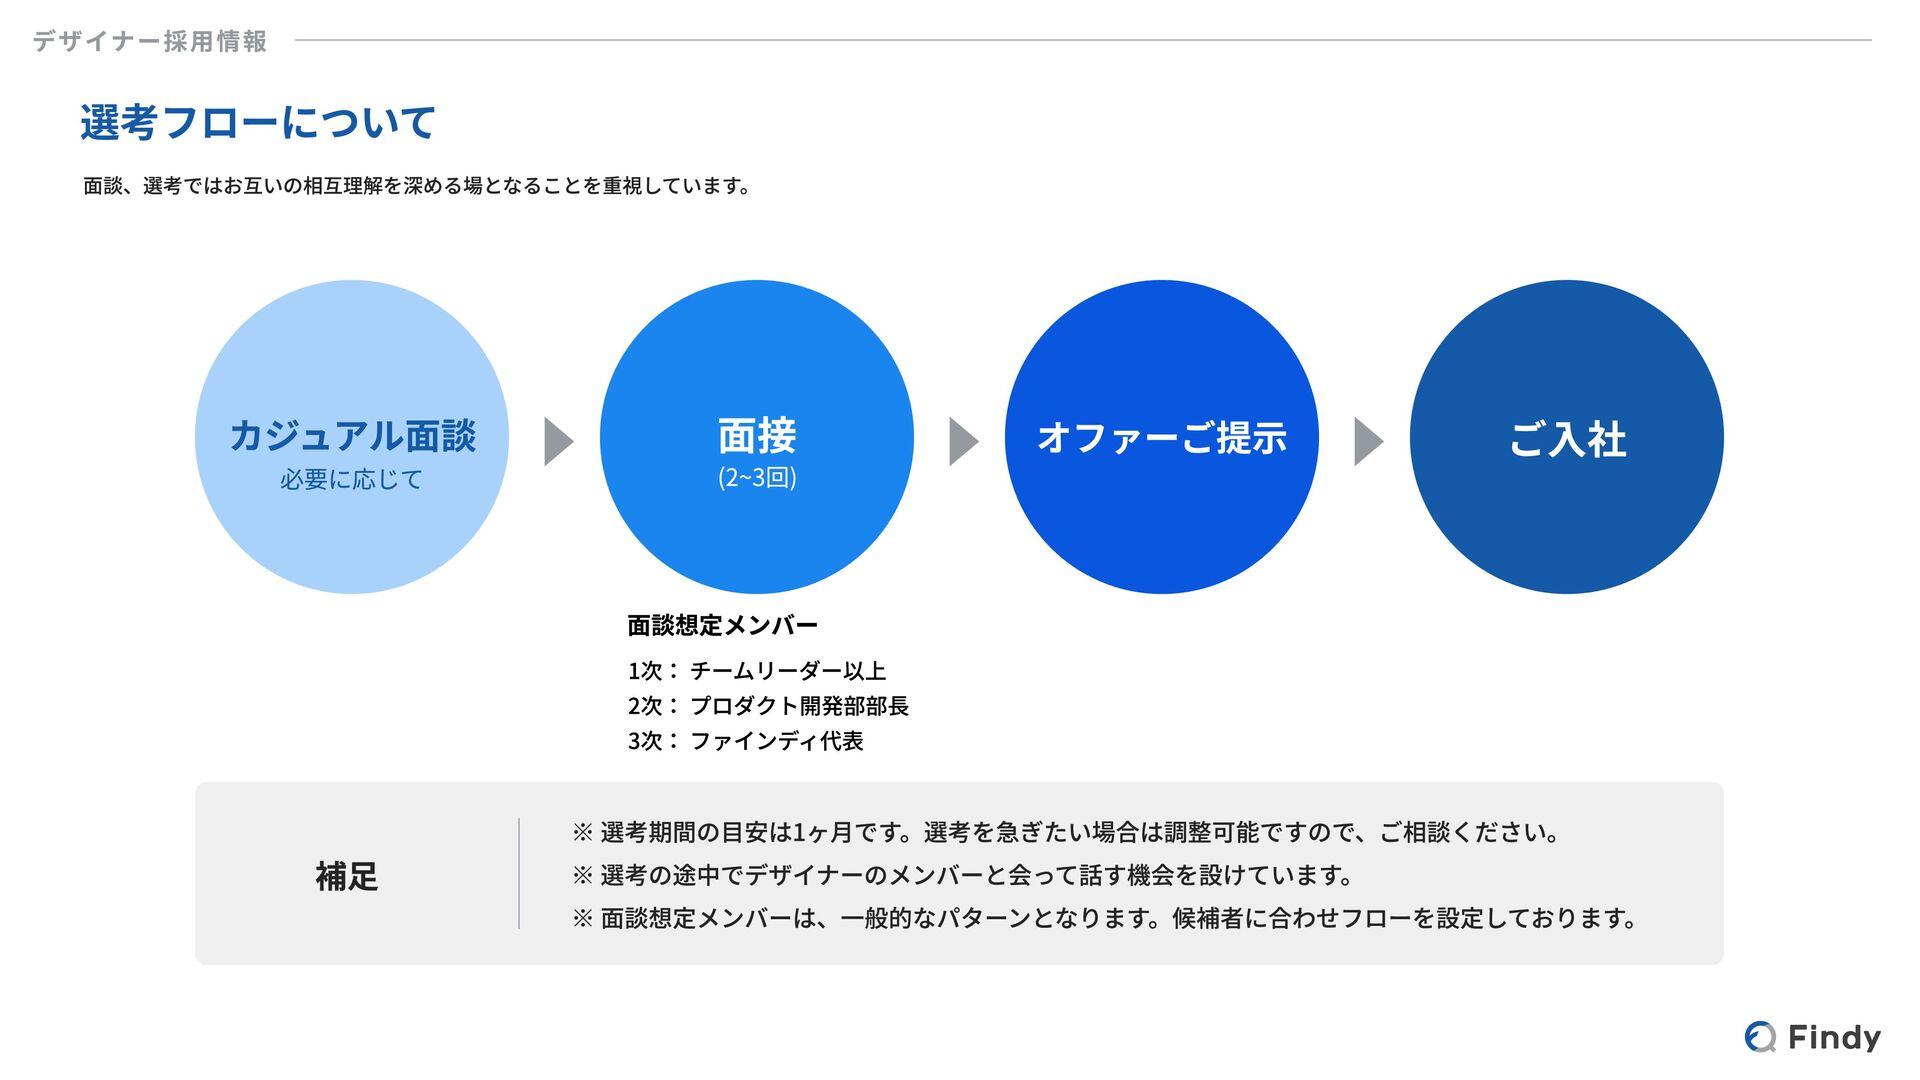 Expectations for Designers Findyのデザイナーに期待していること...